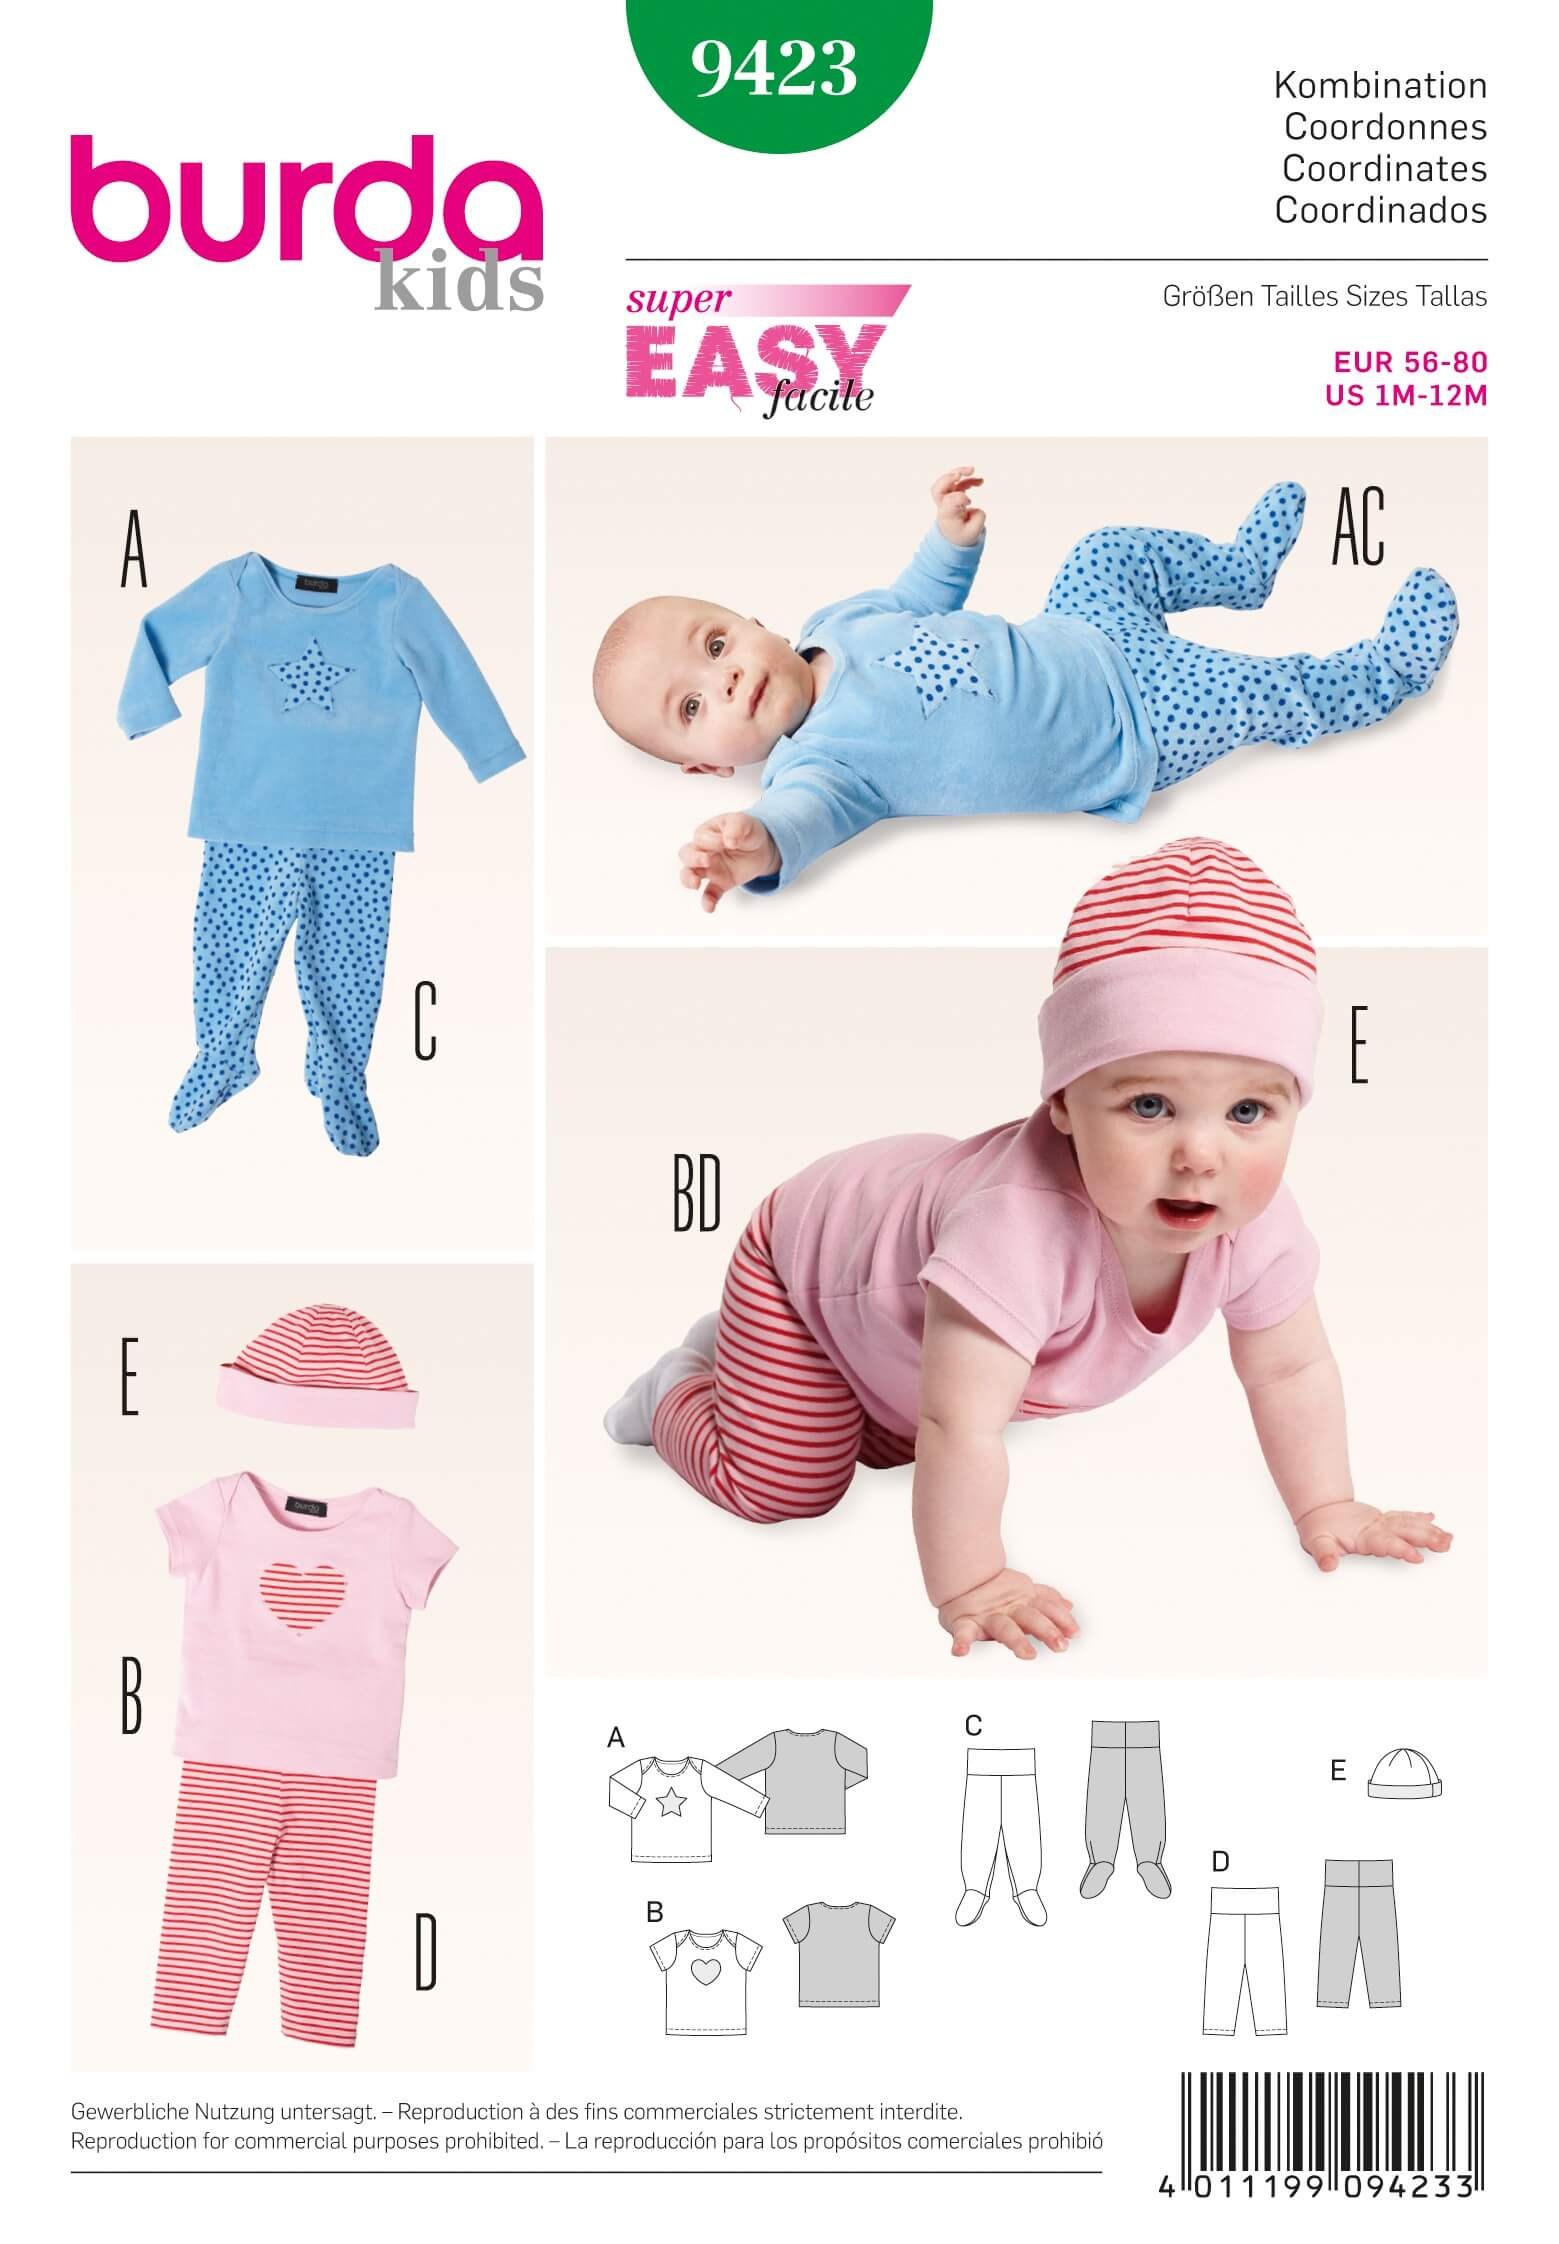 Burda Kids Baby Trousers Top Hat Fabric Sewing Pattern 9423